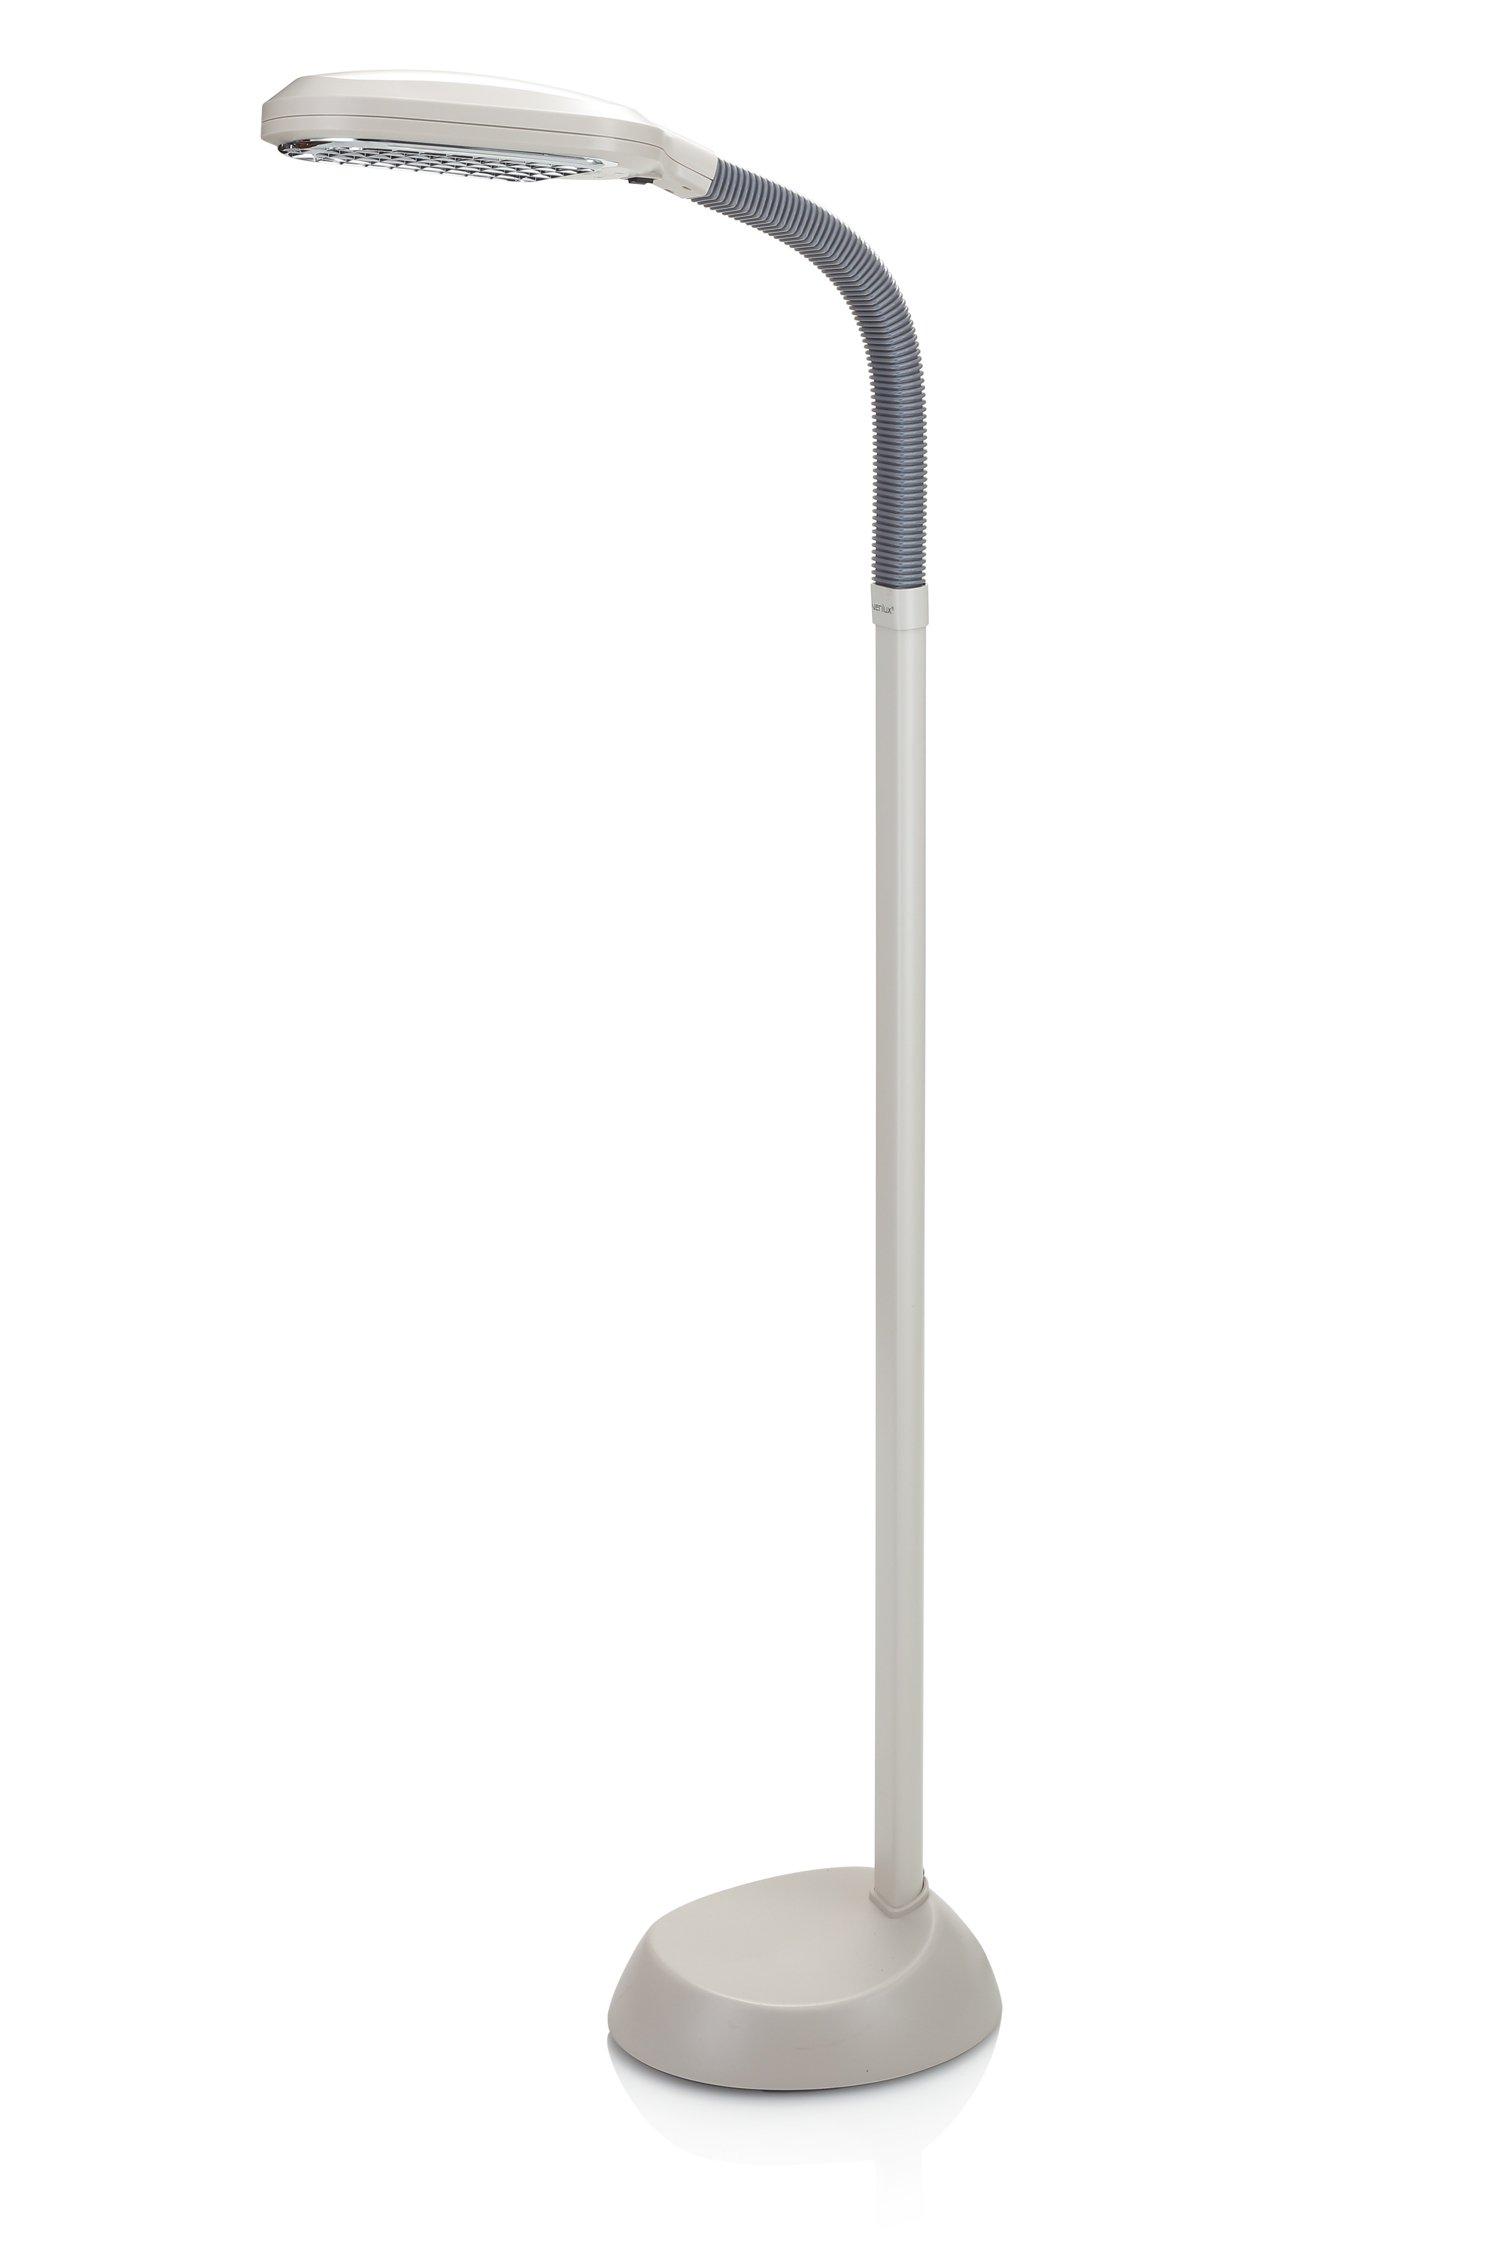 Cheap full spectrum floor lamp find full spectrum floor lamp deals get quotations verilux original natural spectrum floor lamp with adjustable easyflex gooseneck ivory aloadofball Gallery